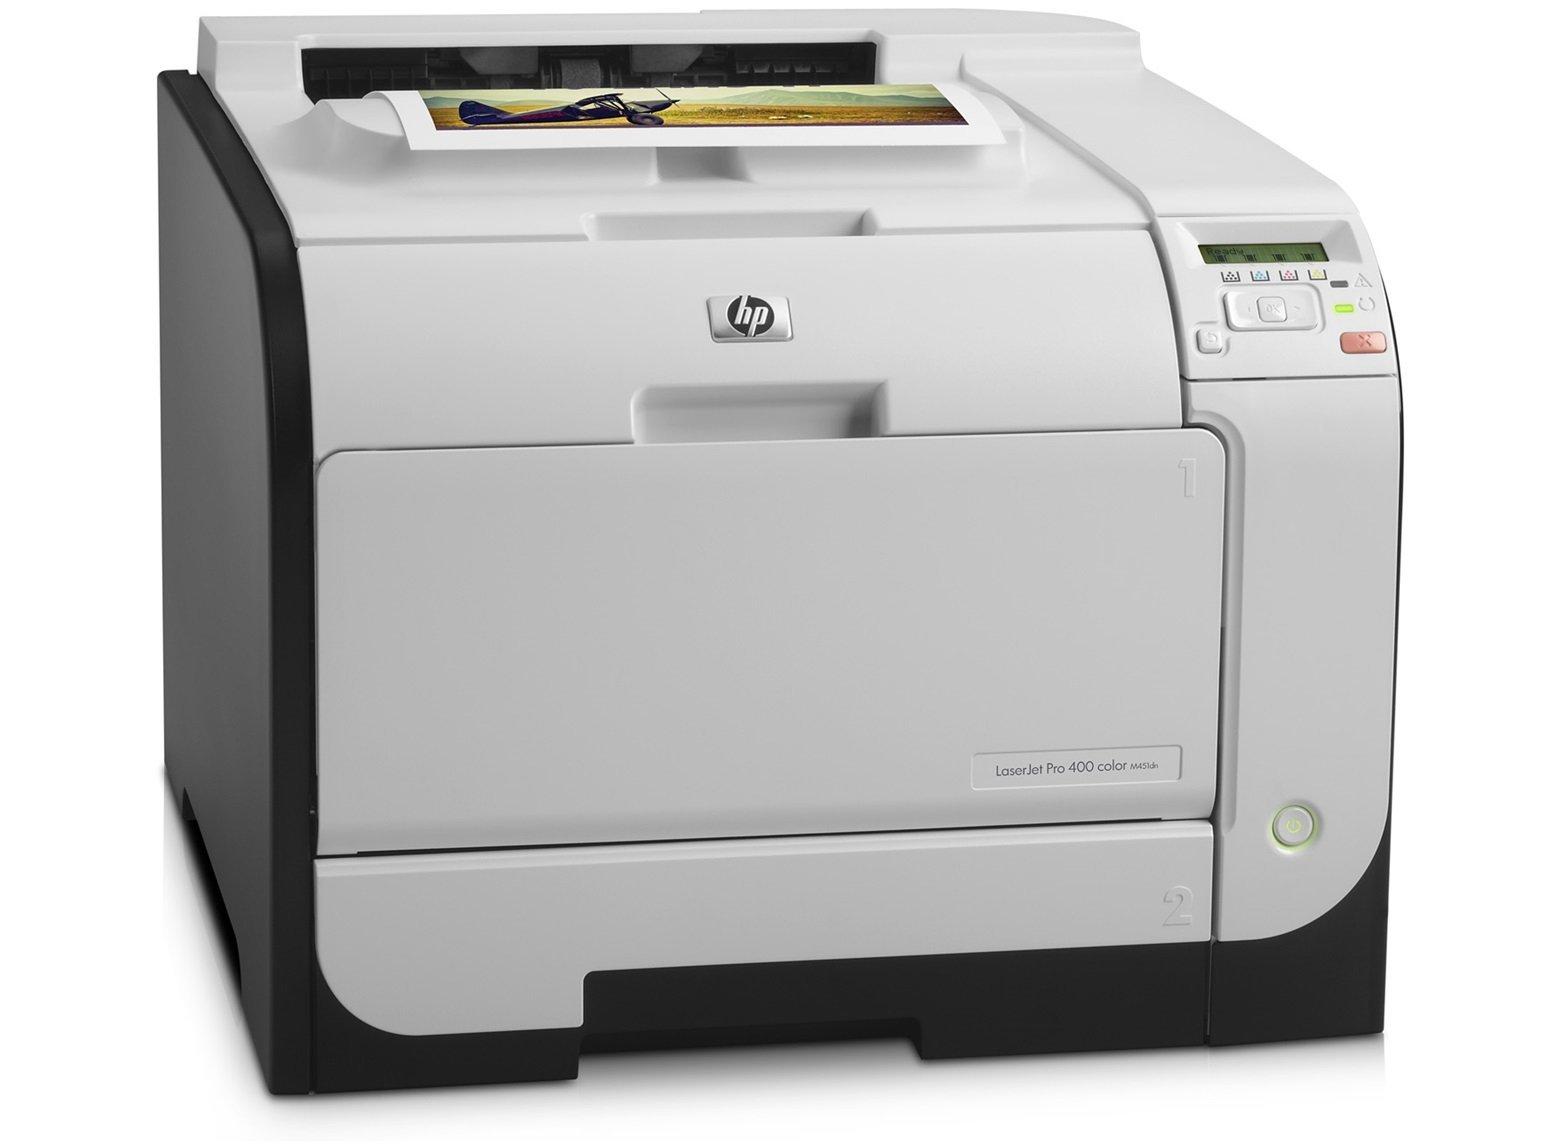 HP LaserJet Pro 400 m451dn Duplex Color Laser Printer (Renewed)